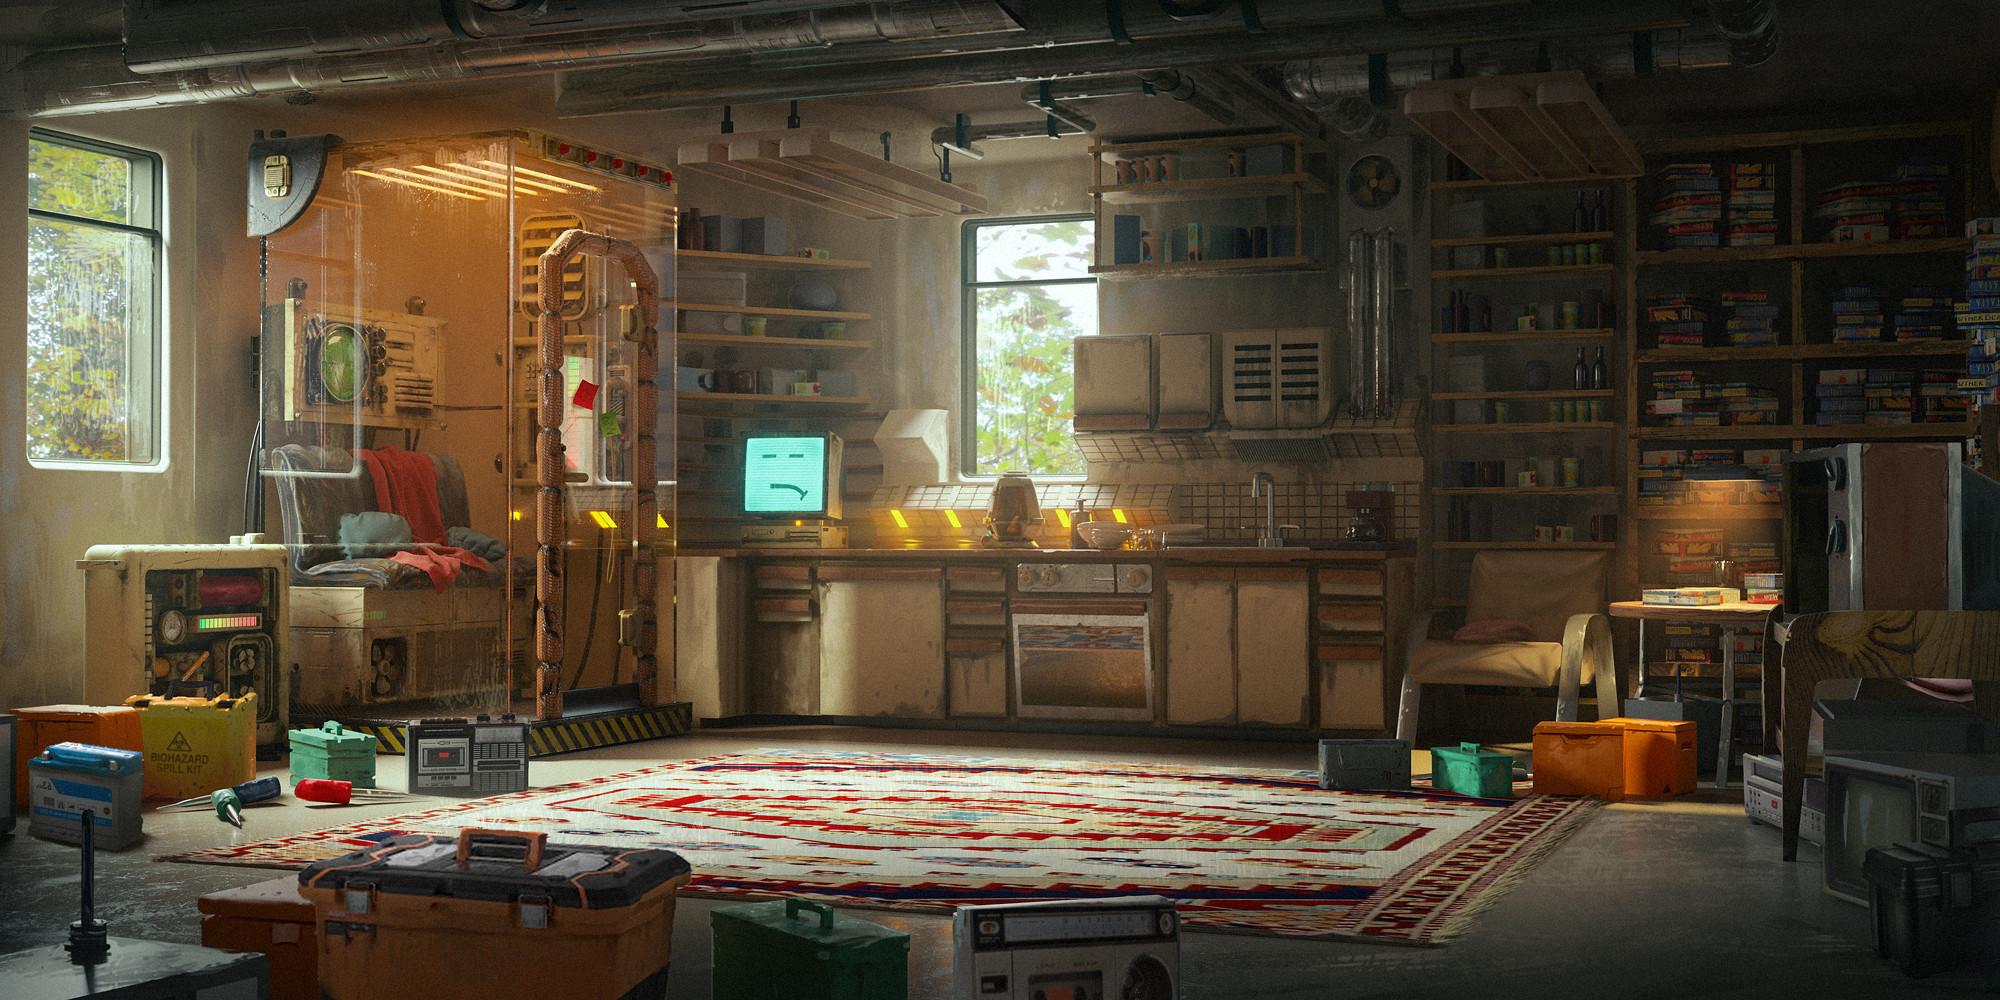 Room concept 1